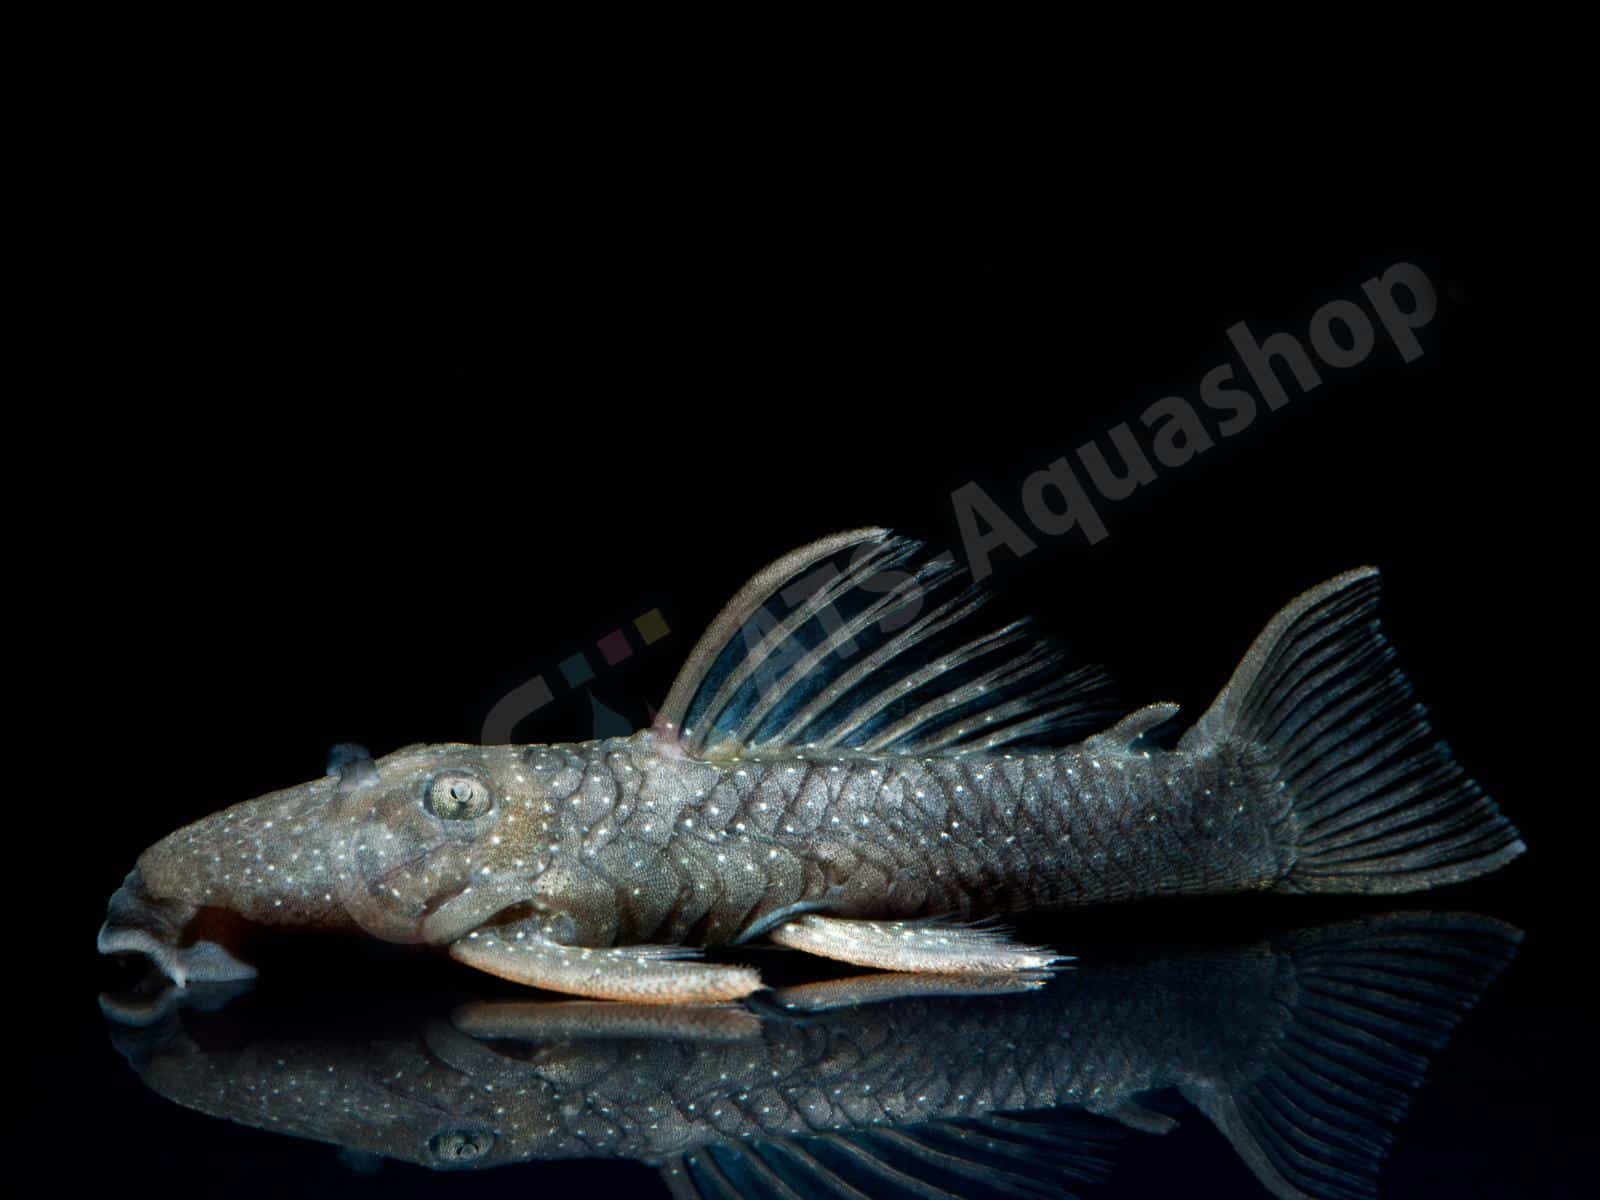 spectrancistrus murinus enrico richter 0292 6